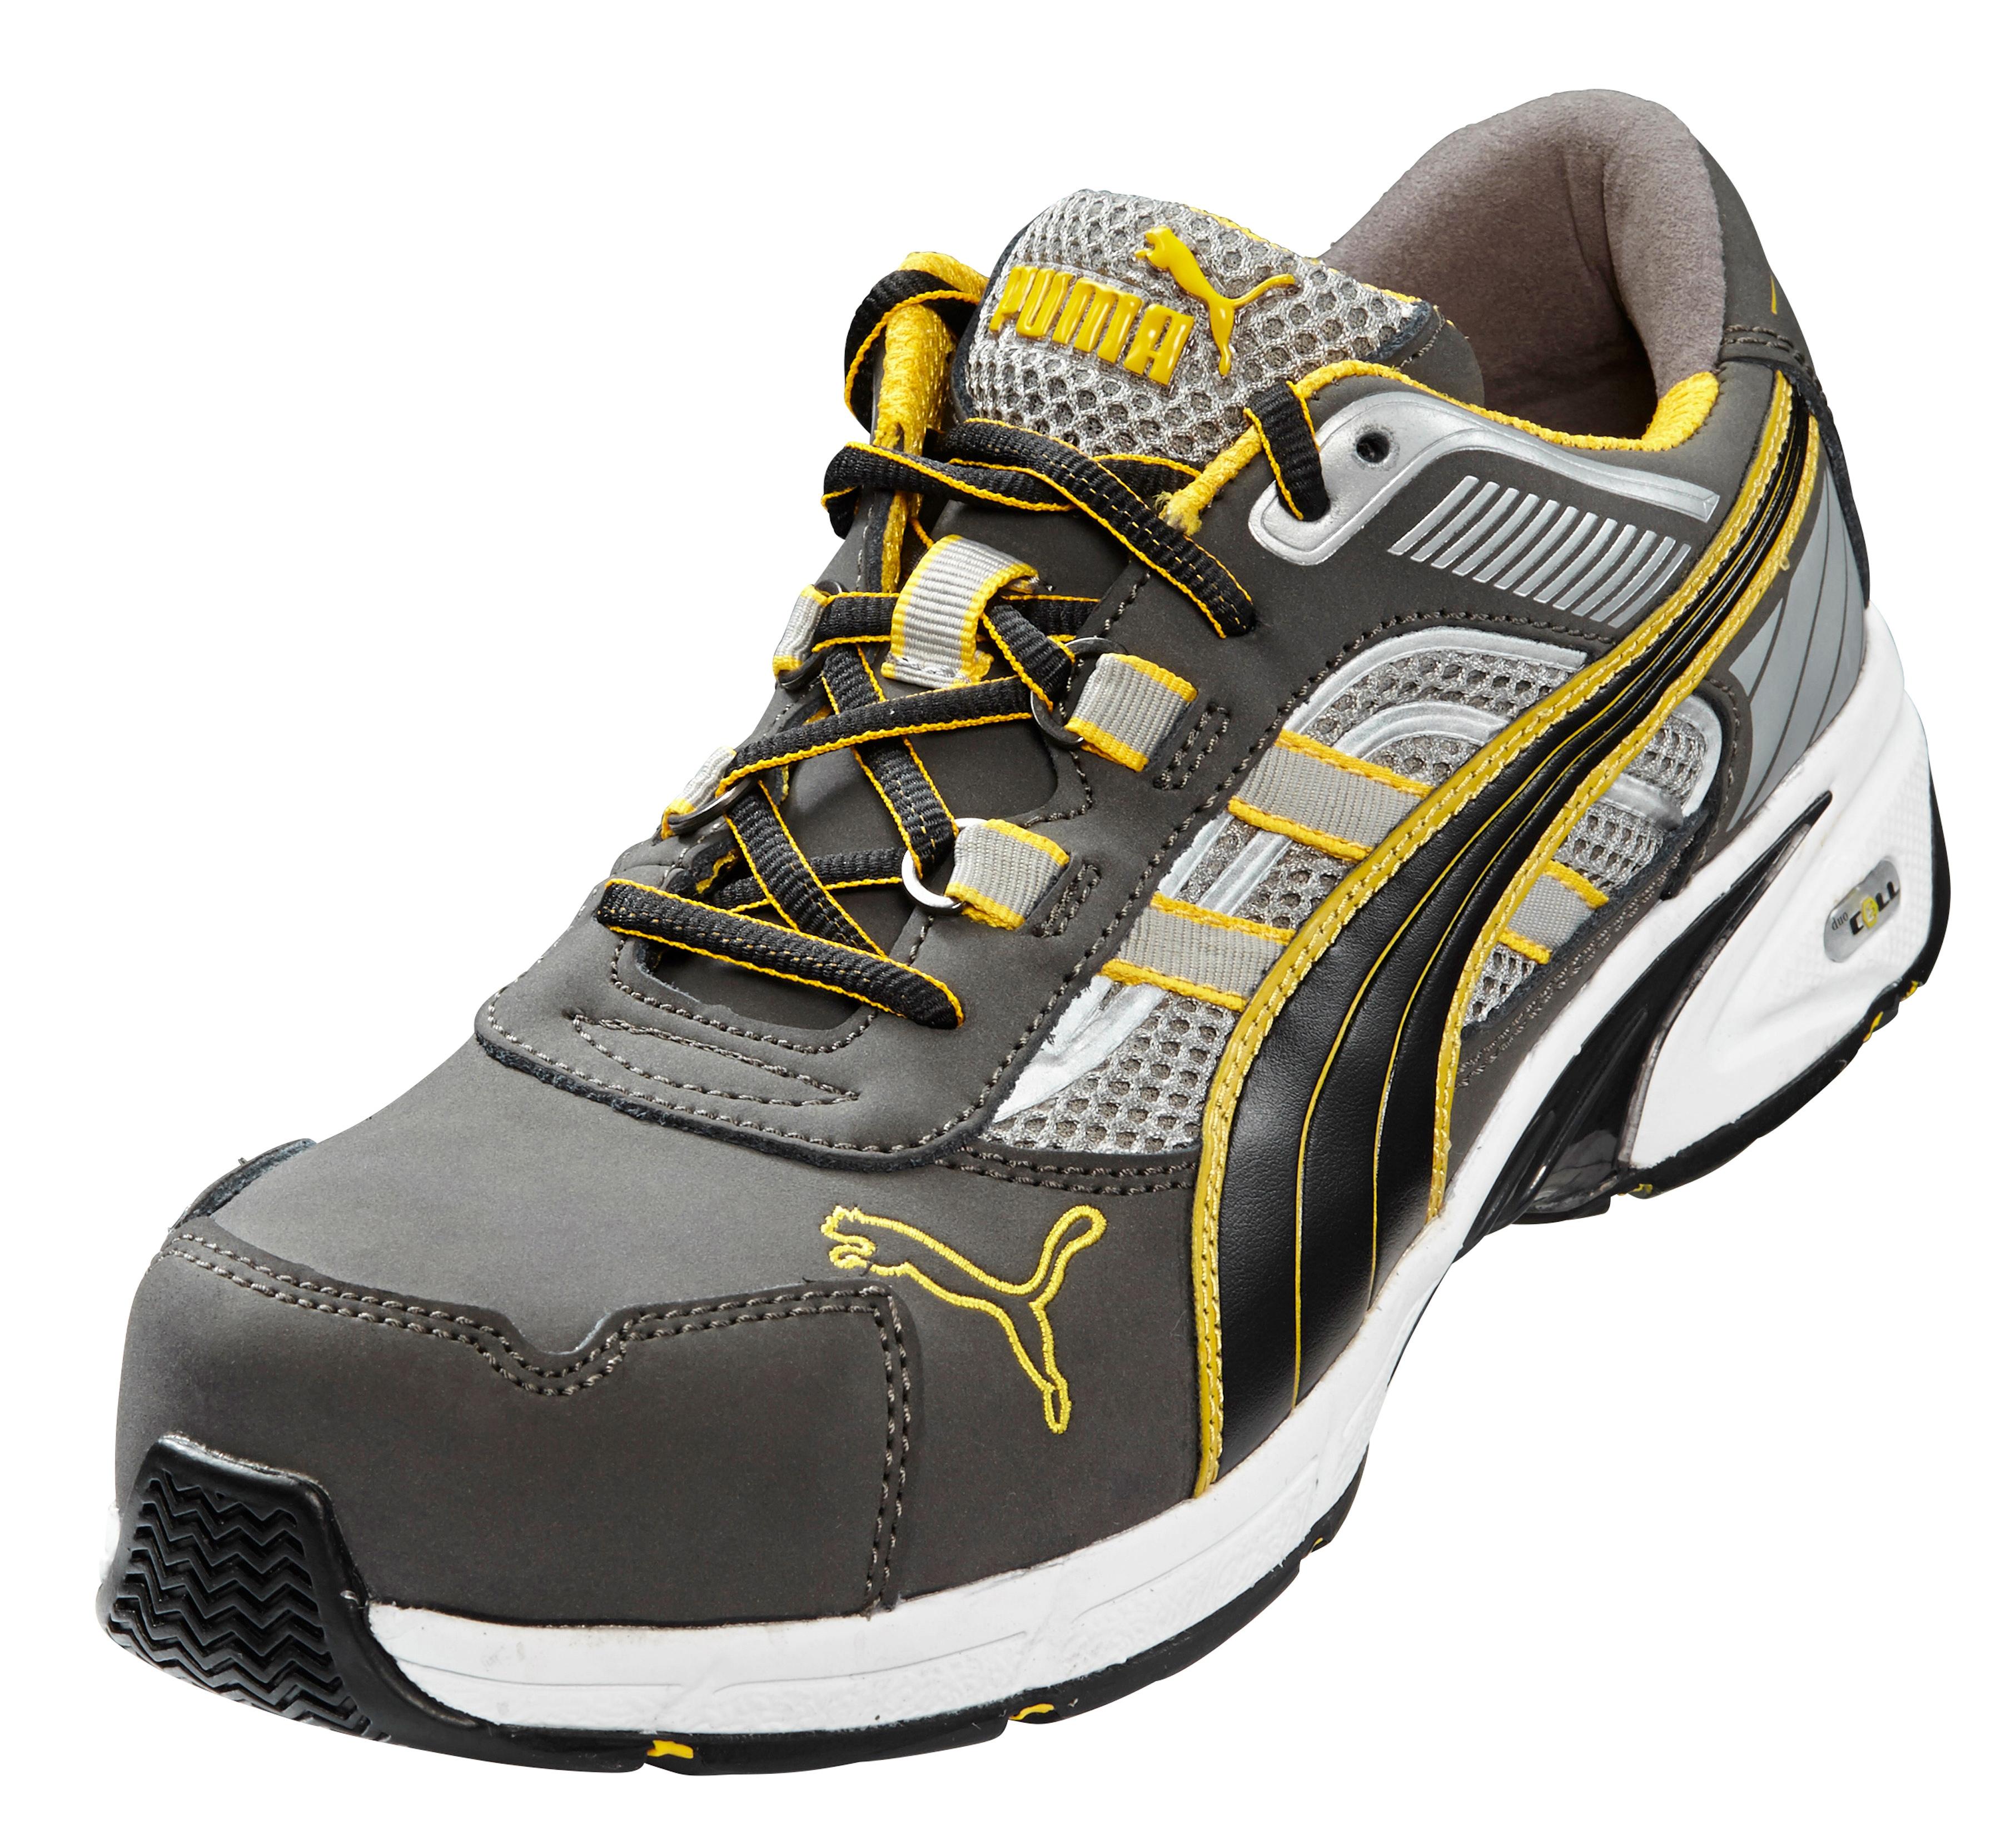 PUMA Sicherheitsschuh S1P | Schuhe > Sicherheitsschuhe | Puma